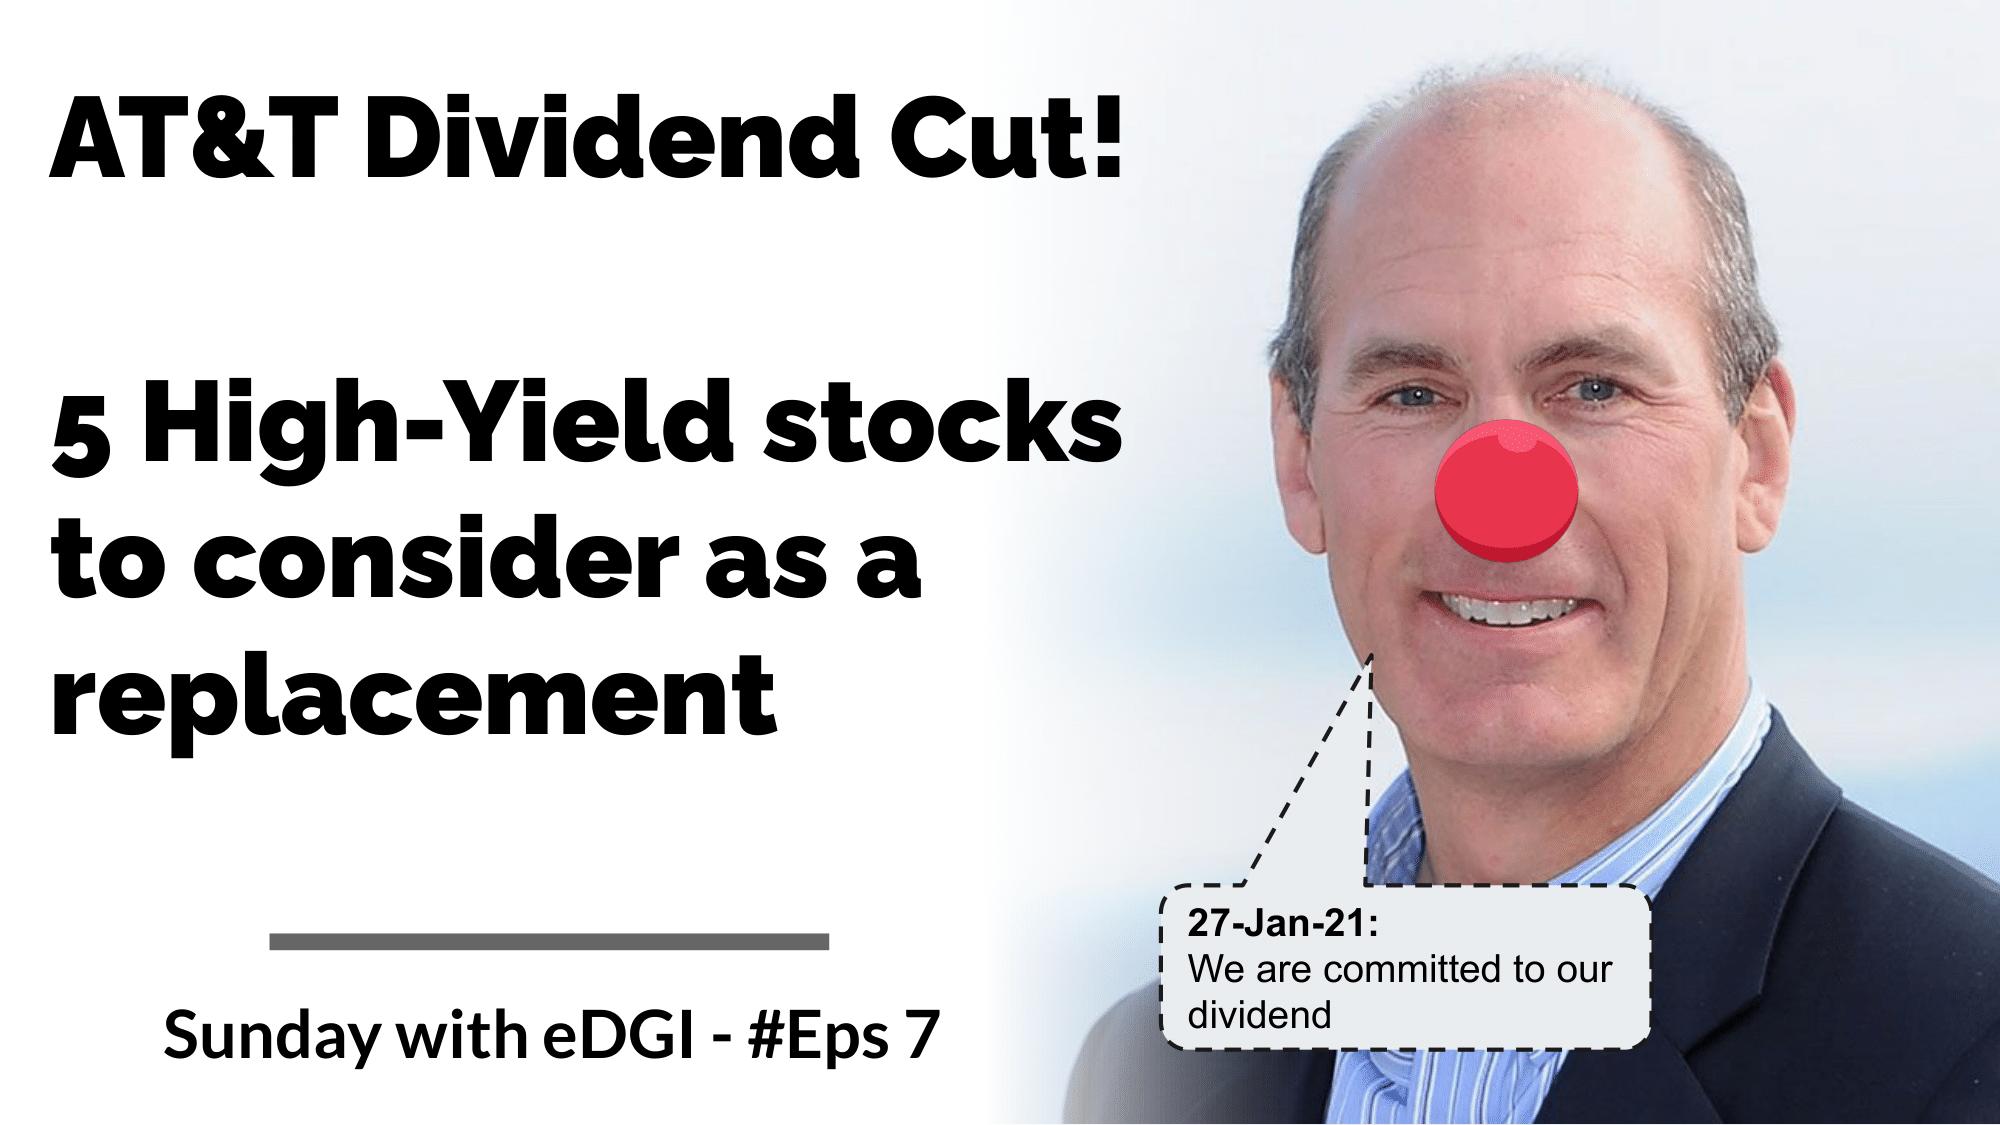 AT&T Dividend Cut - High Yield alternatives